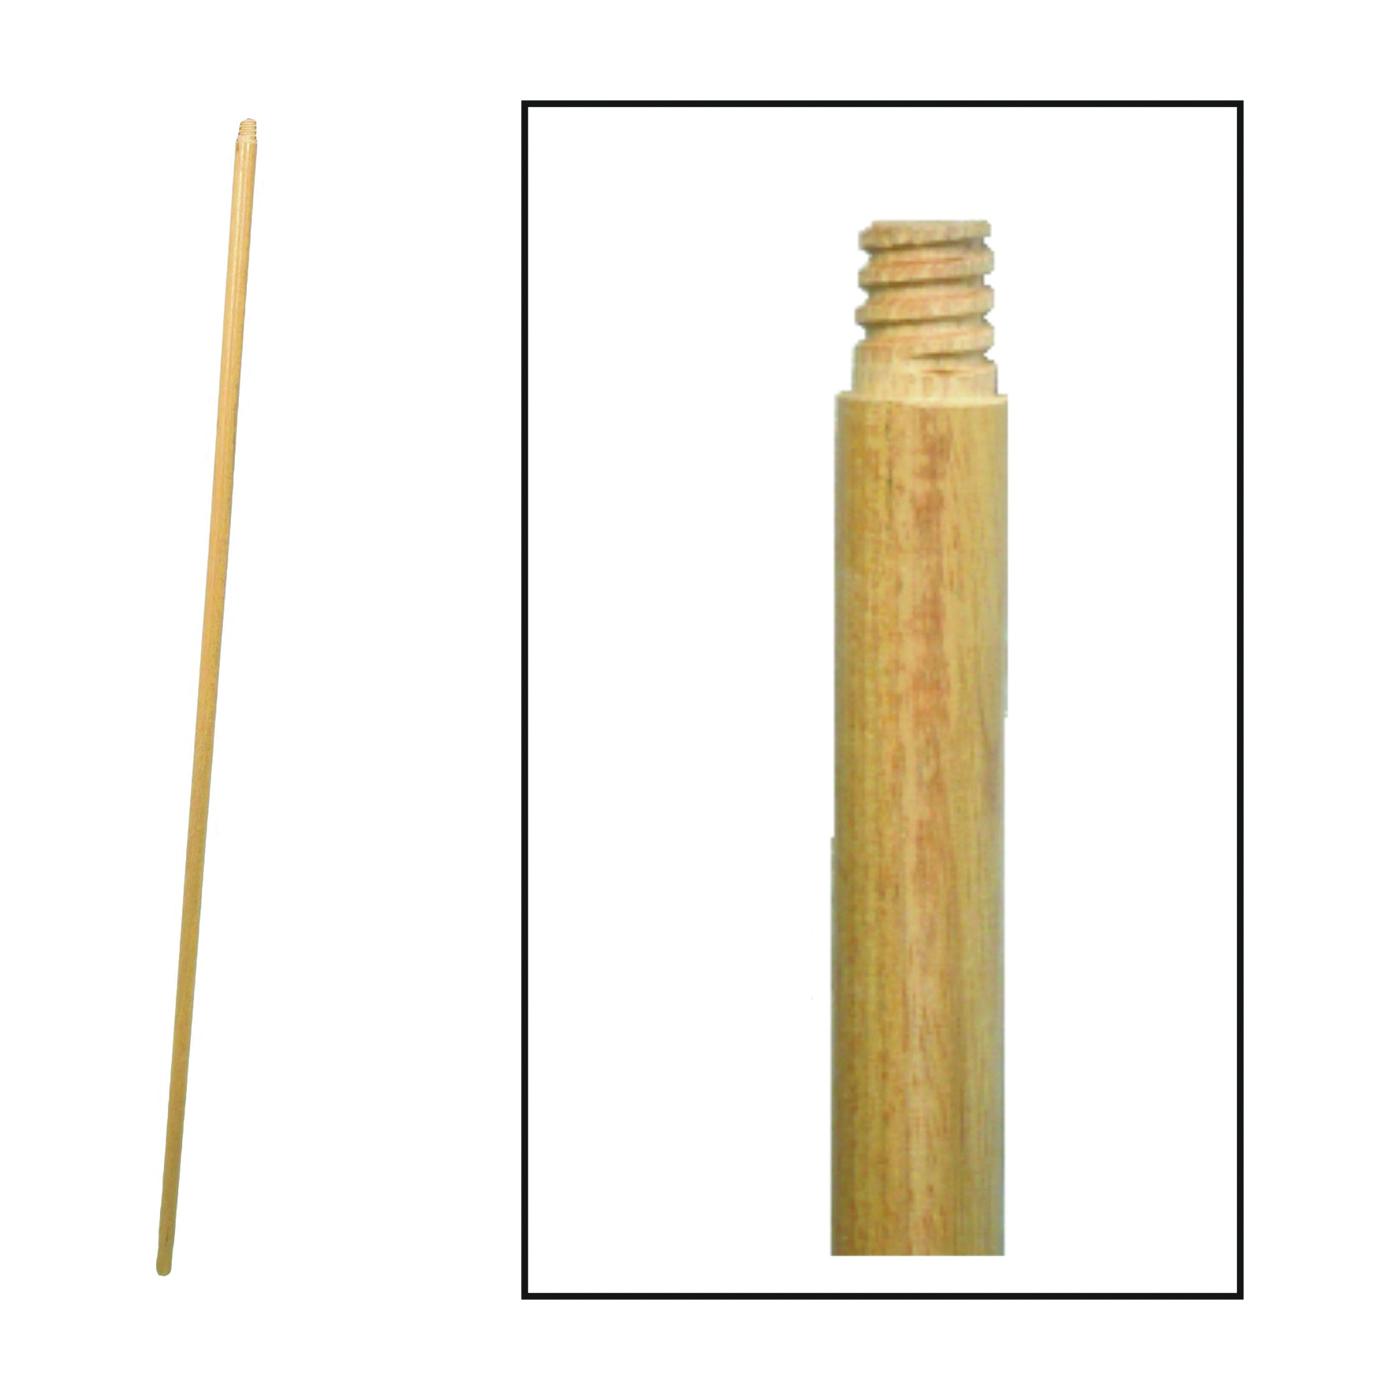 Picture of BIRDWELL 534-12 Broom Handle, 15/16 in Dia, 72 in L, Threaded, Hardwood